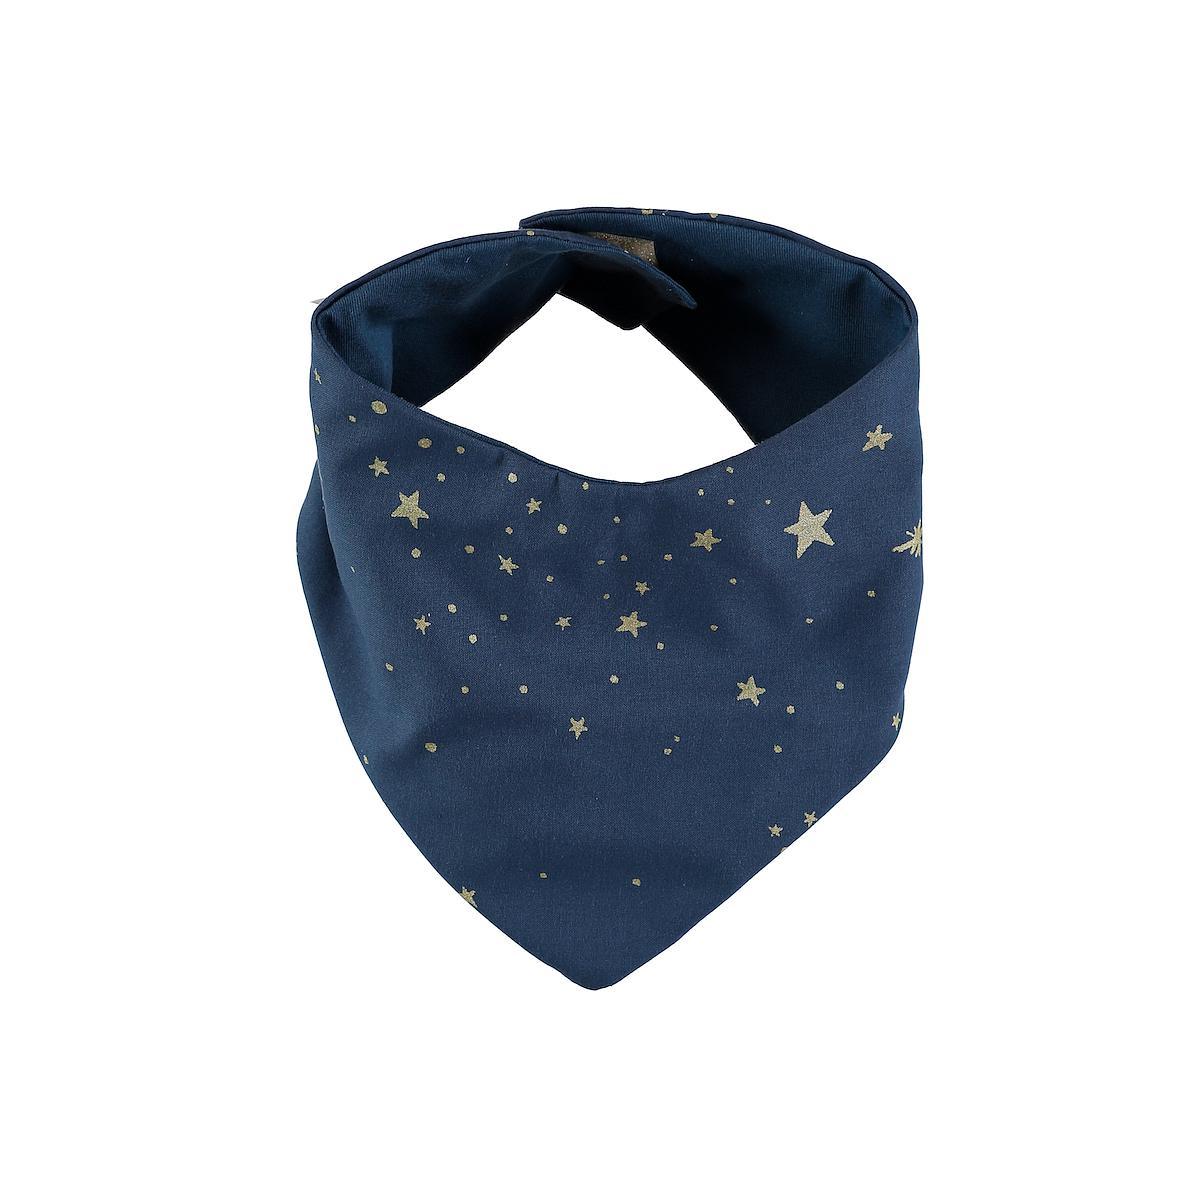 Babero bandana LUCKY ELEMENTS Nobodinoz gold stella-night blue